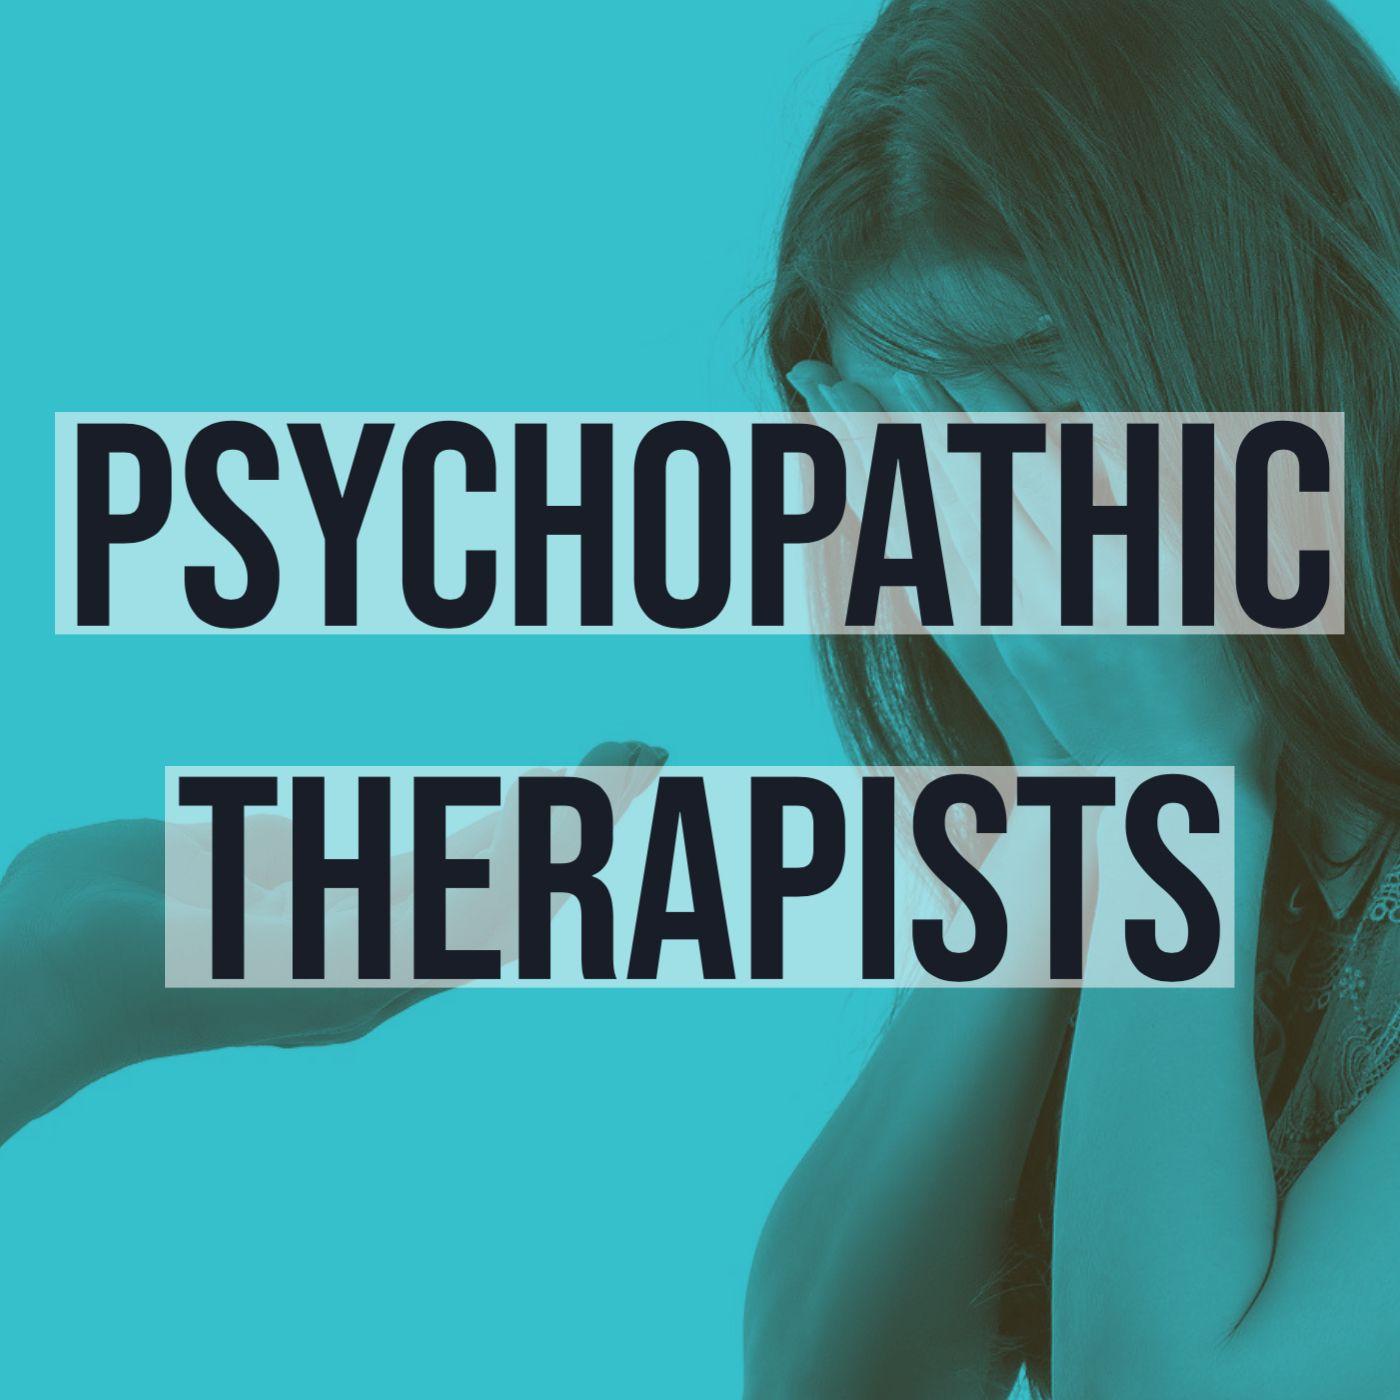 Psychopathic Therapists (2017 Rerun)